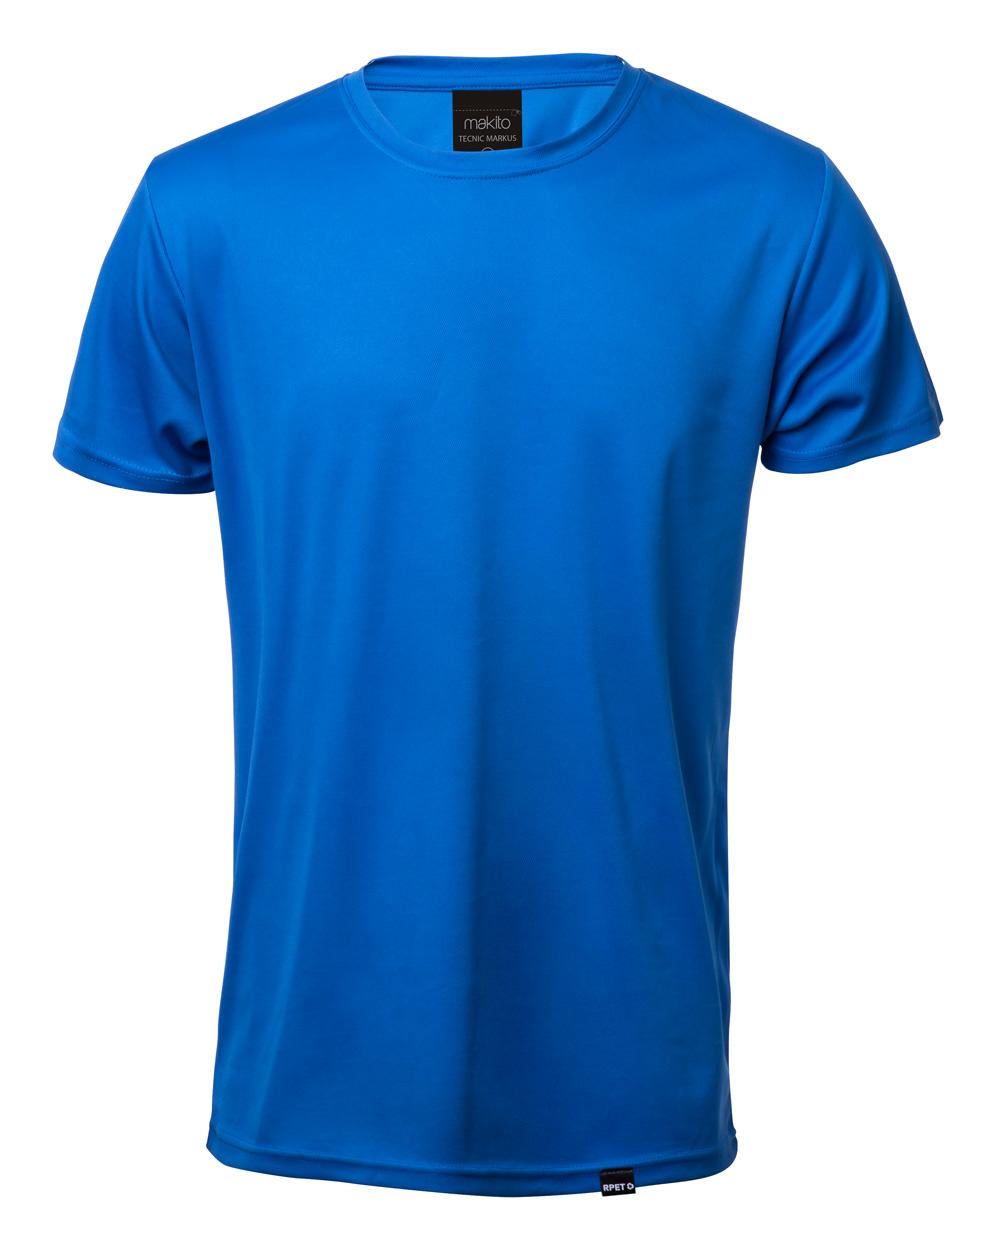 Tecnic Markus RPET sport T-shirt